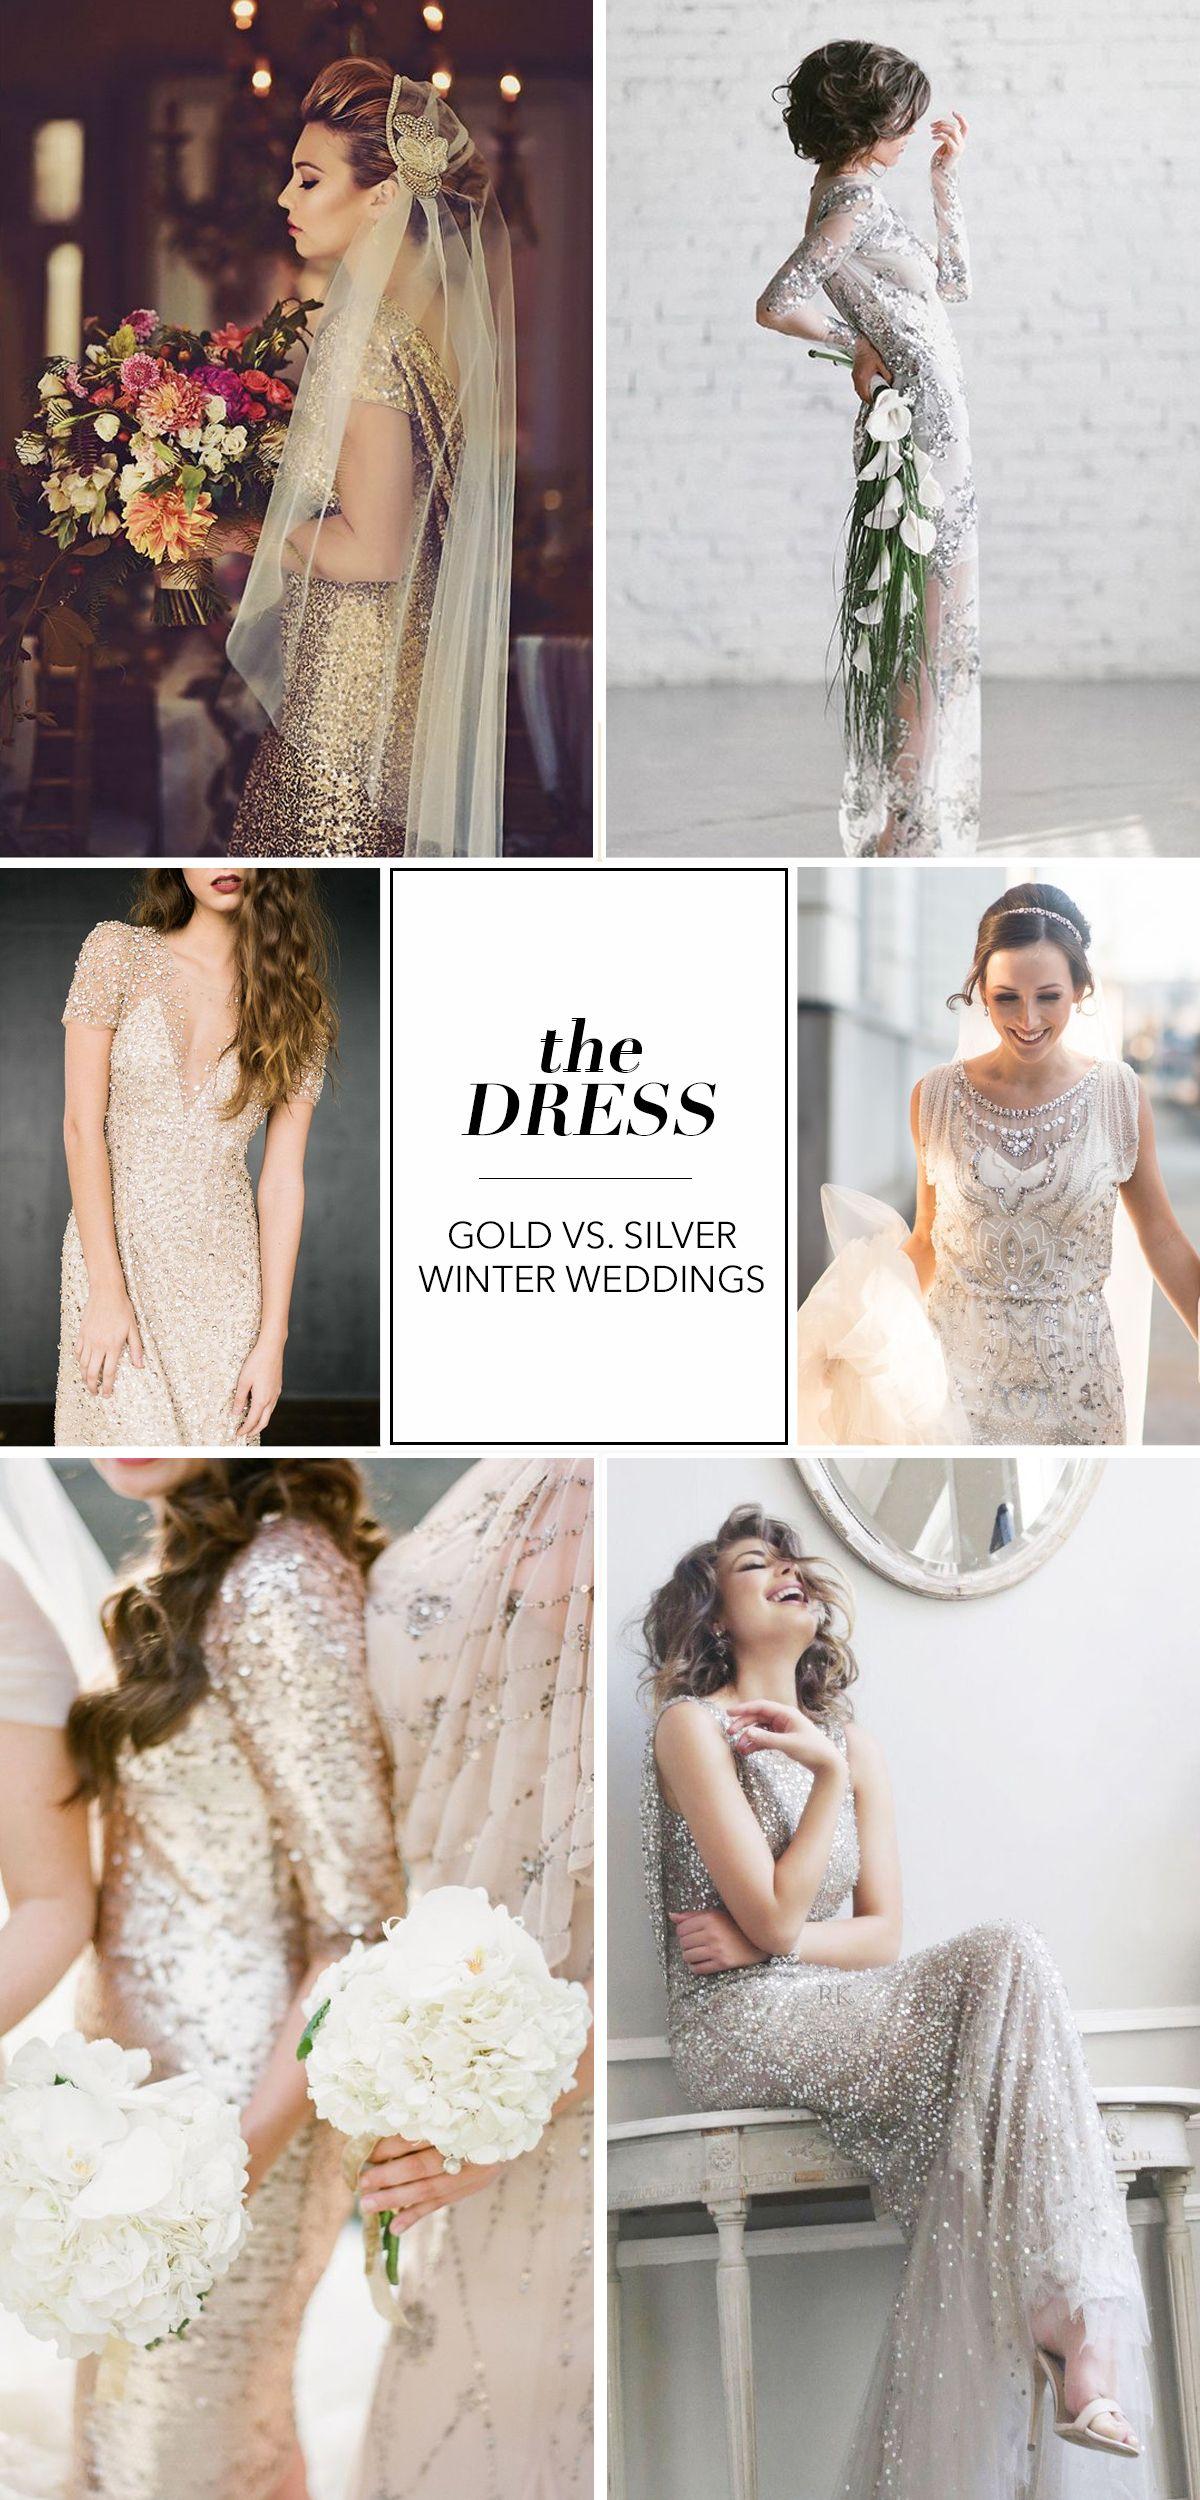 Dresses for a winter wedding reception  THE DRESS  GOLD vs SILVER Winter Wedding Inspiration  Darby u Joan